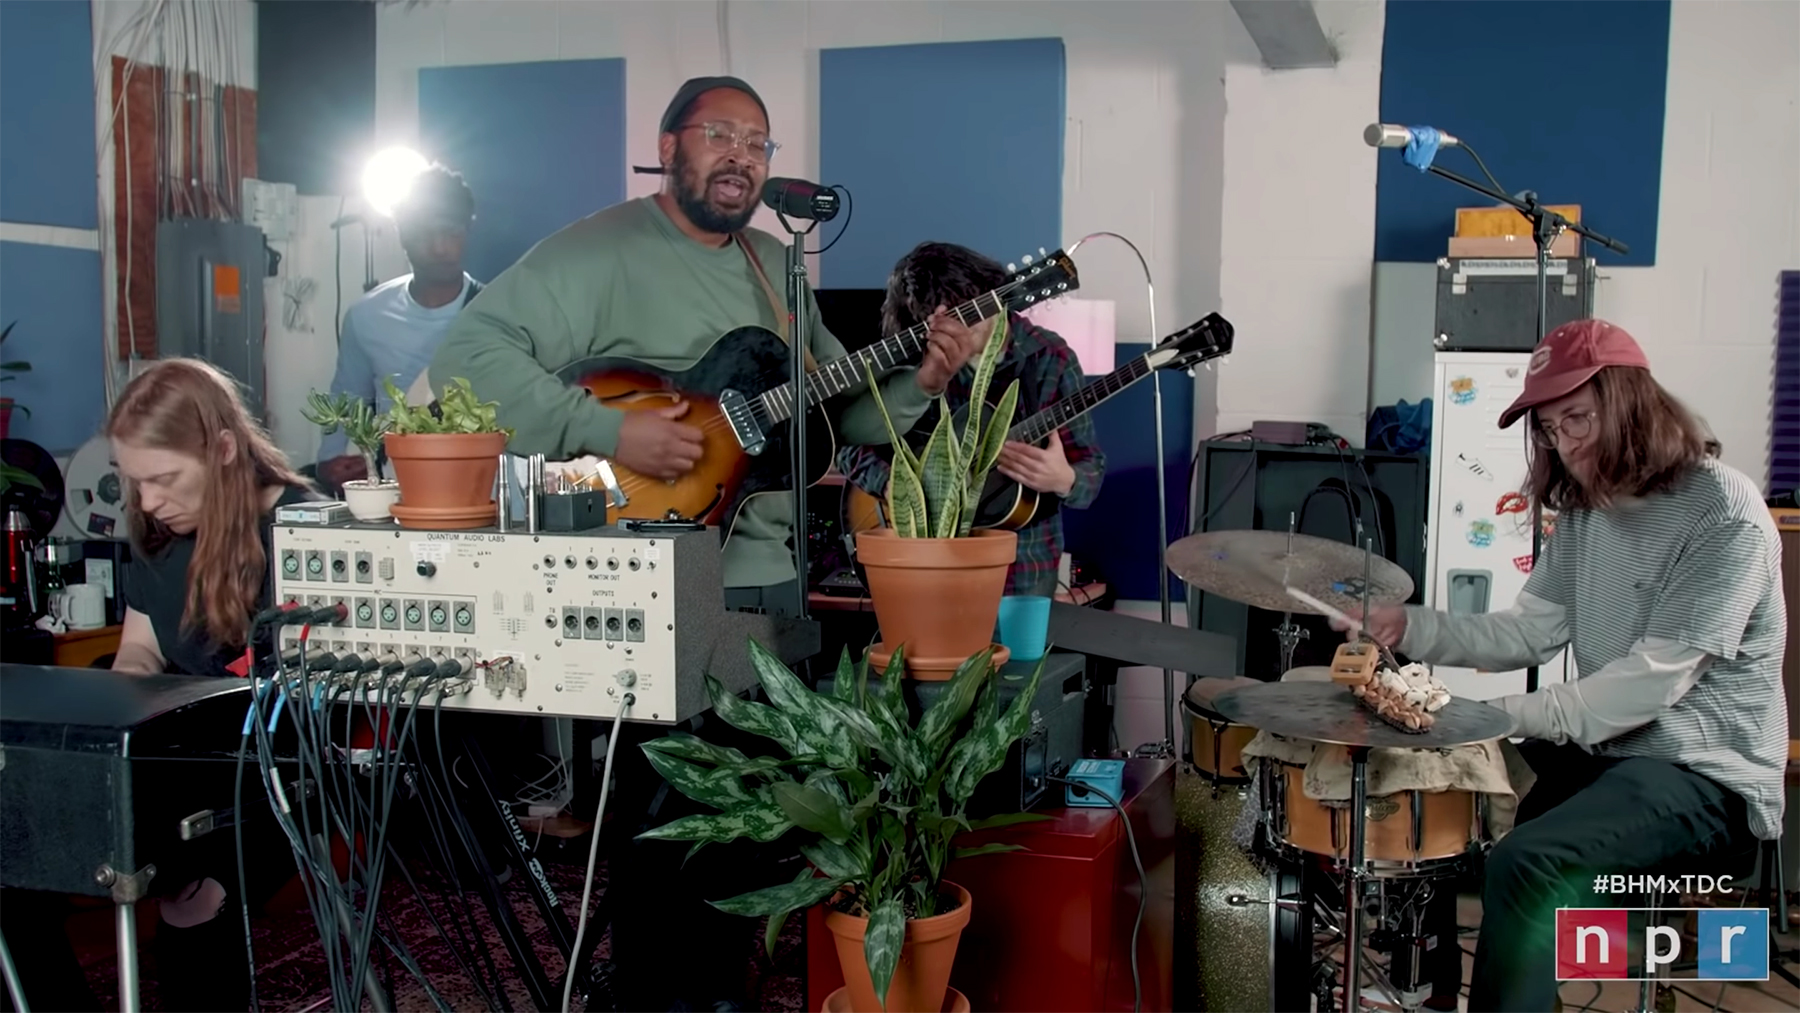 Bartees Strange Performs 'Live Forever' Songs for NPR's 'Tiny Desk'